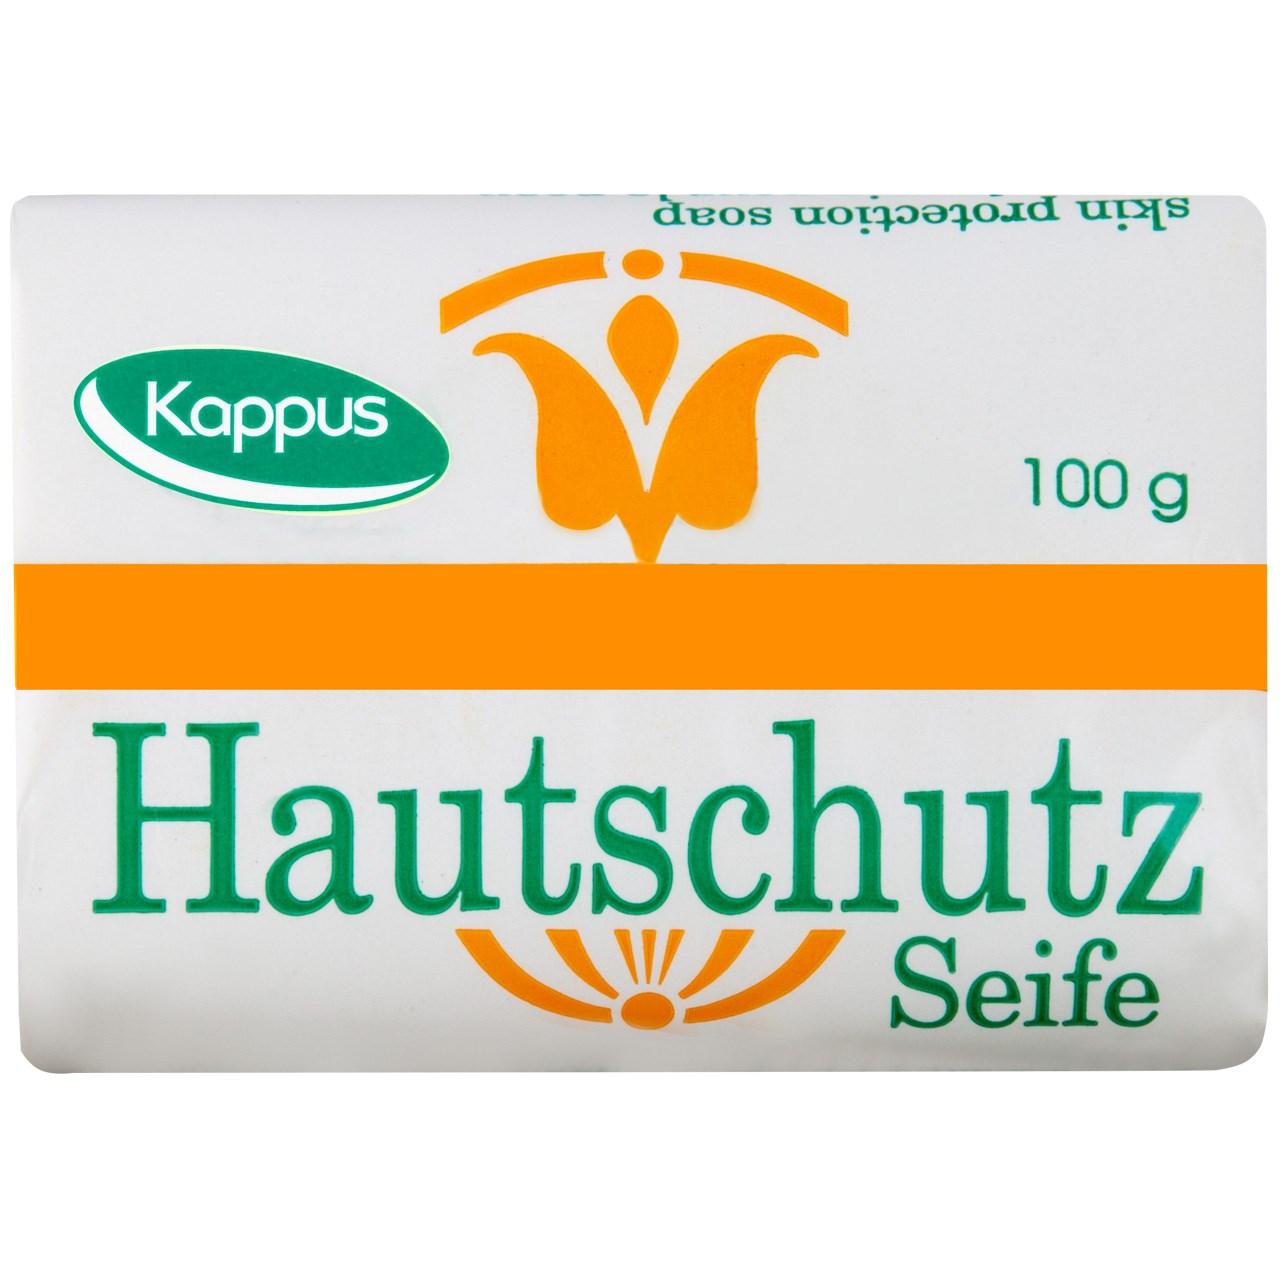 قیمت صابون کاپوس مدل Skin Protection مقدار 100 گرم